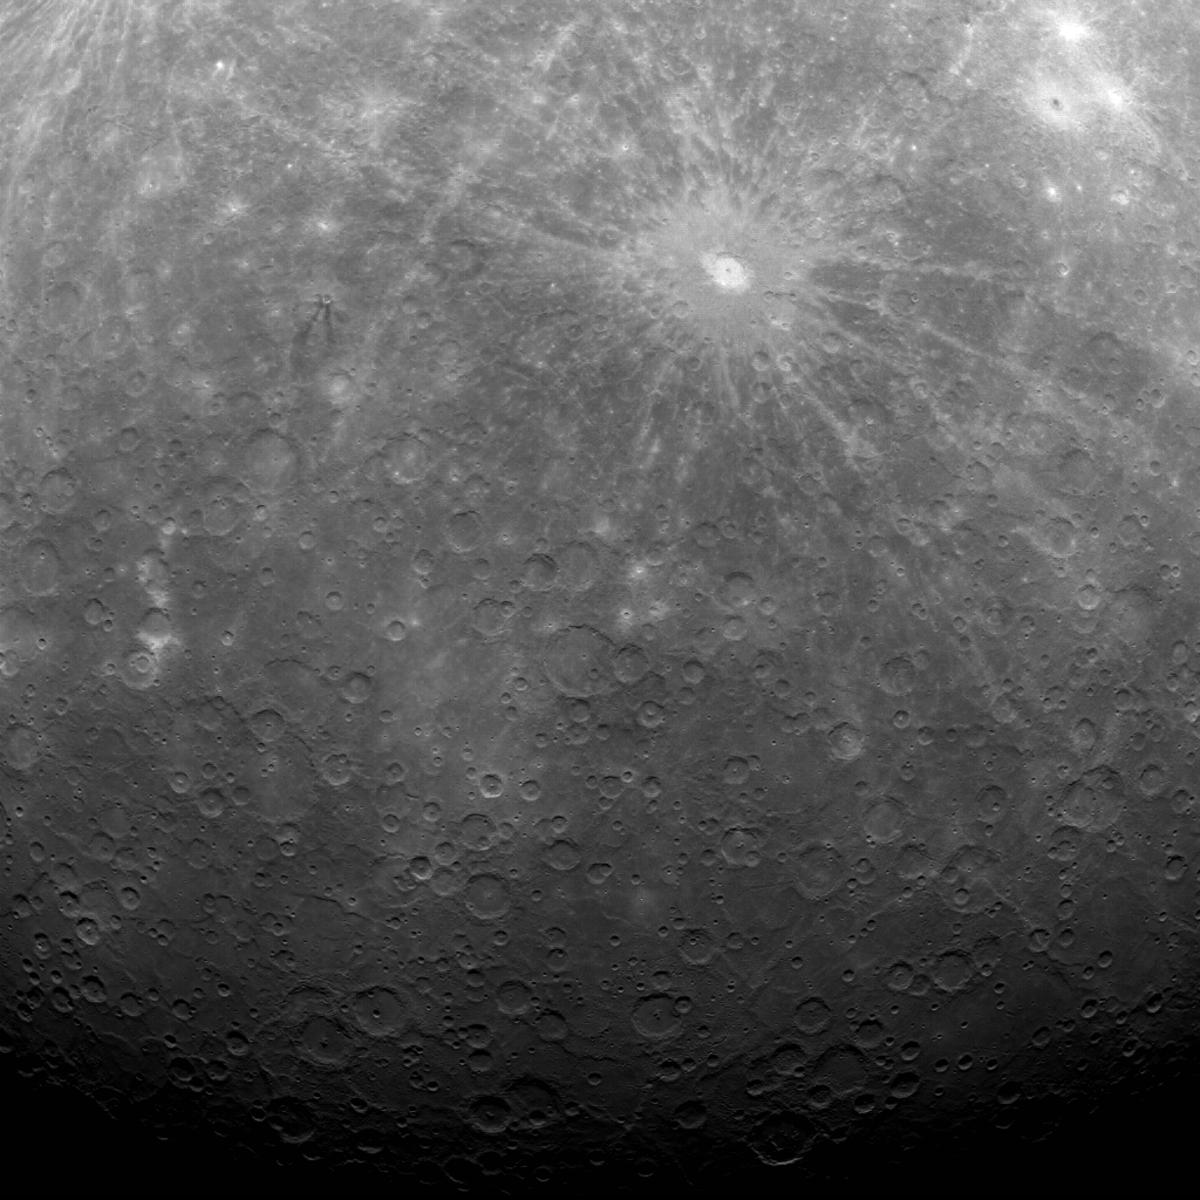 First image taken from orbit.